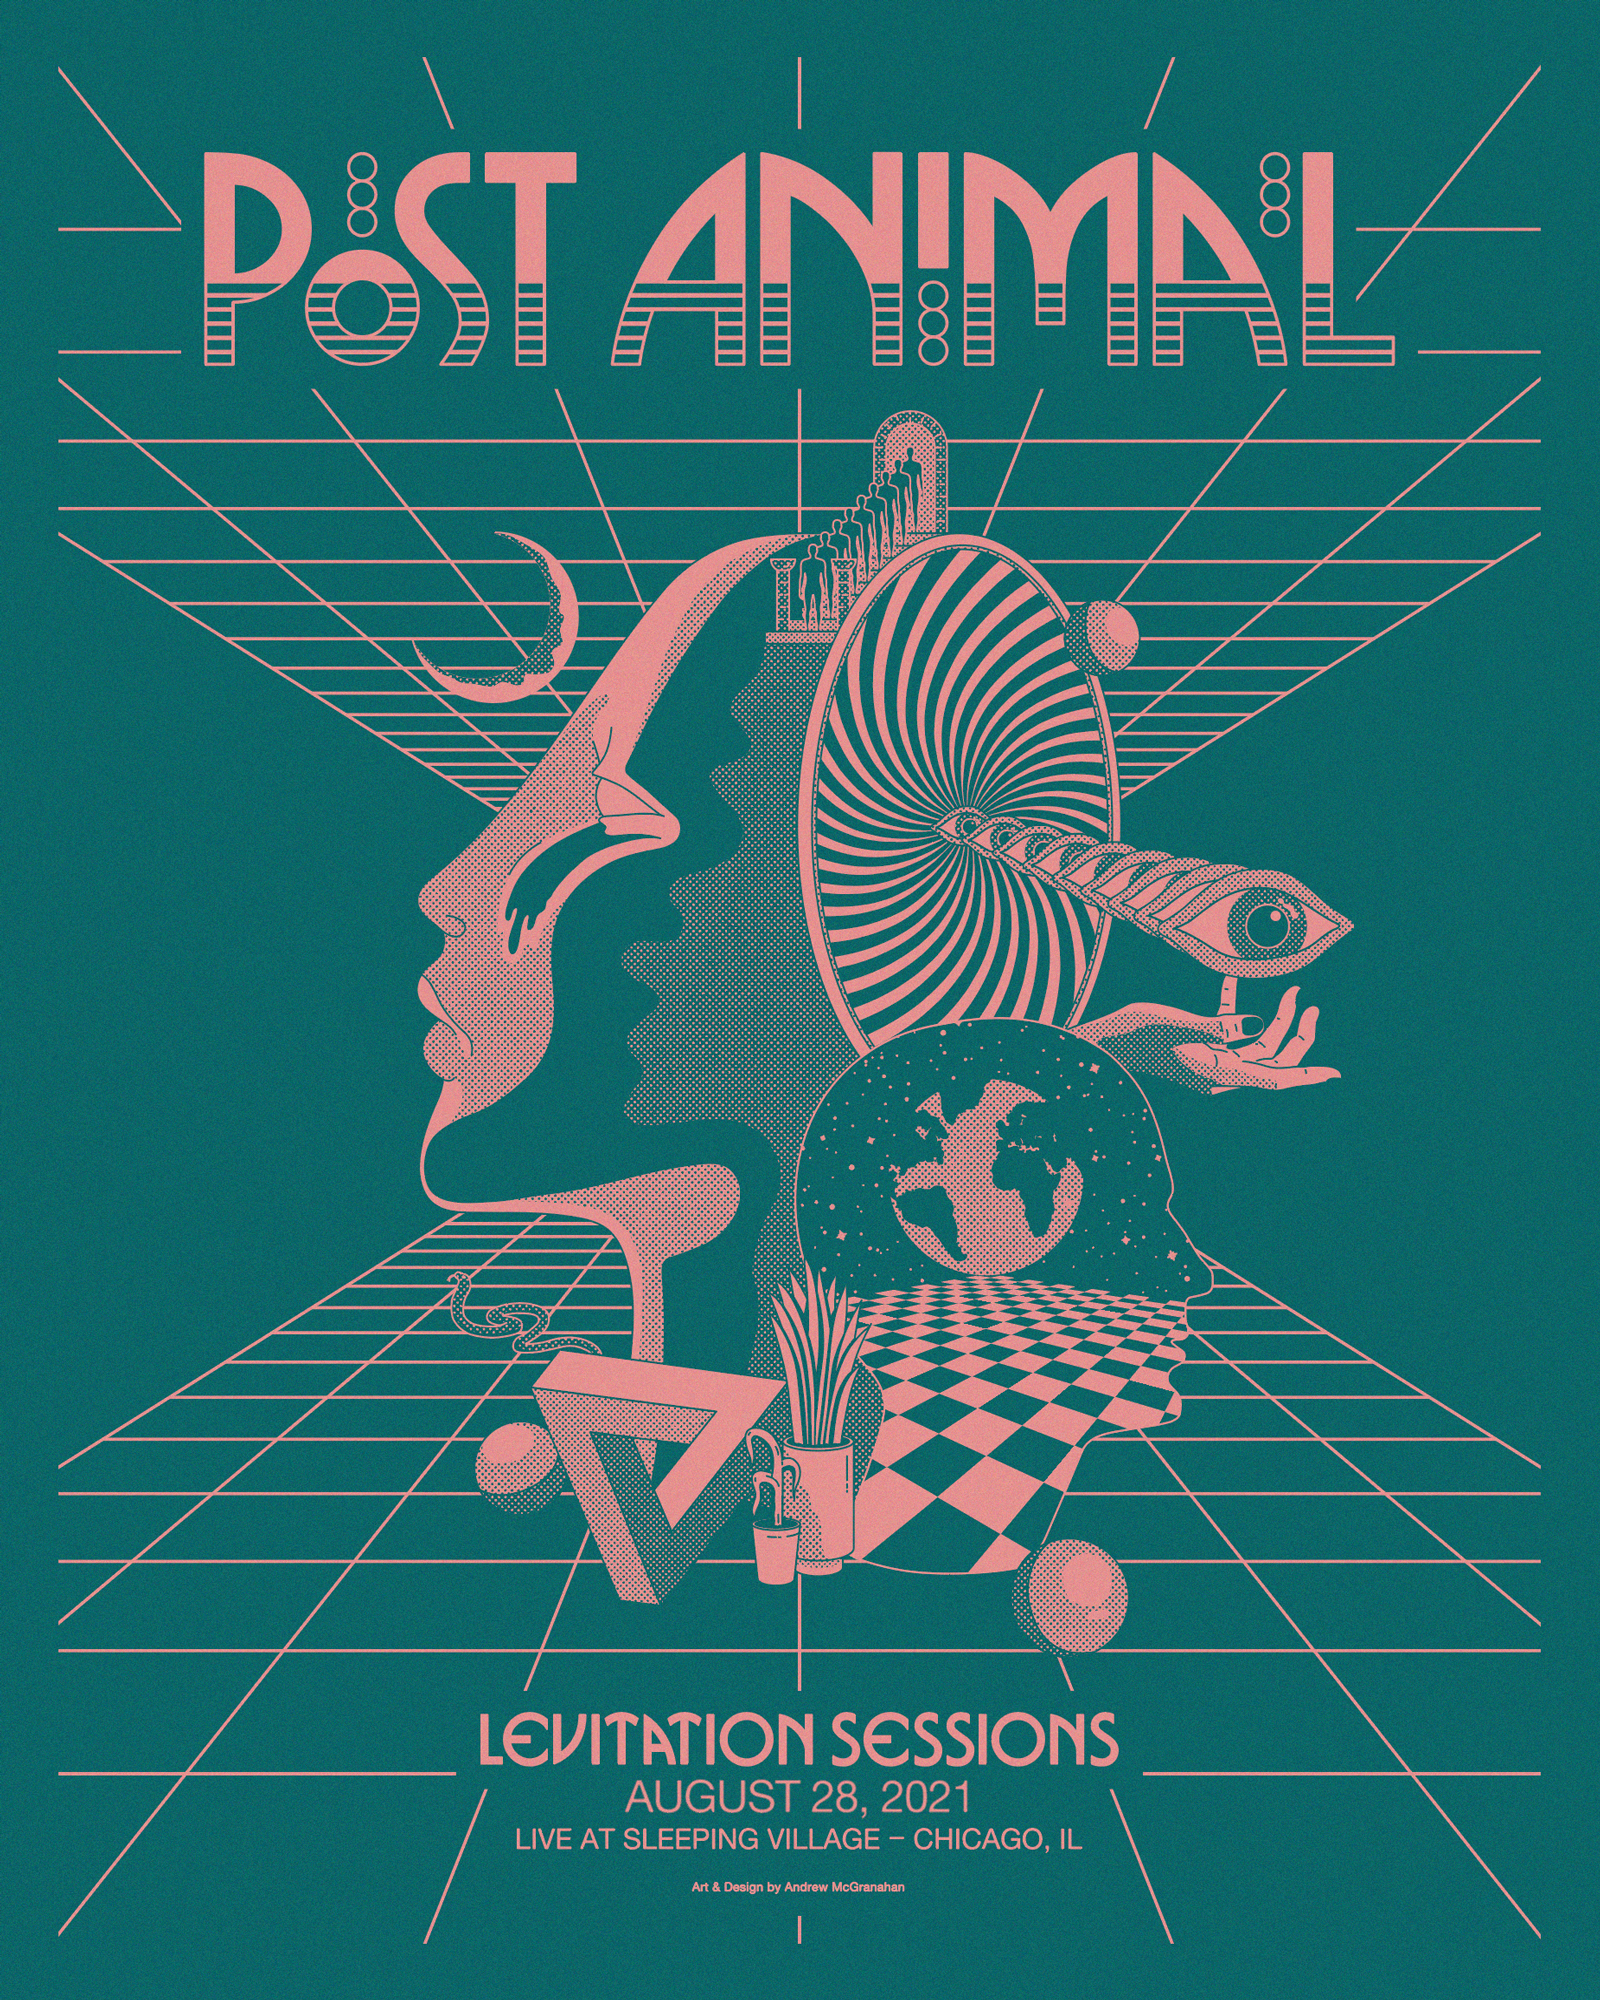 Post Animal - levitation sessions poster - salmon on teal